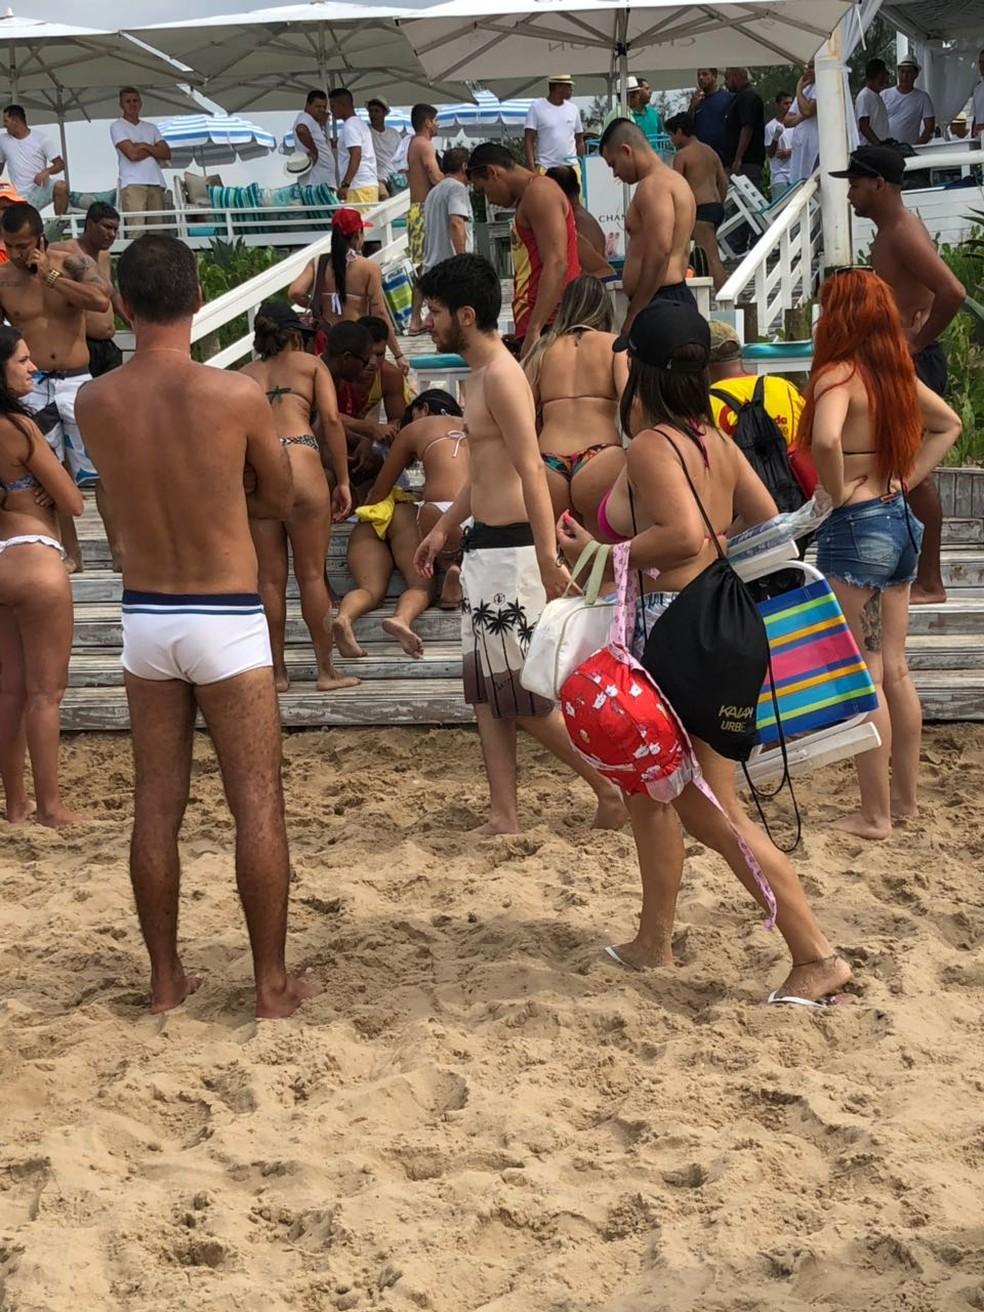 Mulher foi baleada na Praia da Reserva, na Zona Oeste do Rio (Foto: Reprodução/WhatsApp)